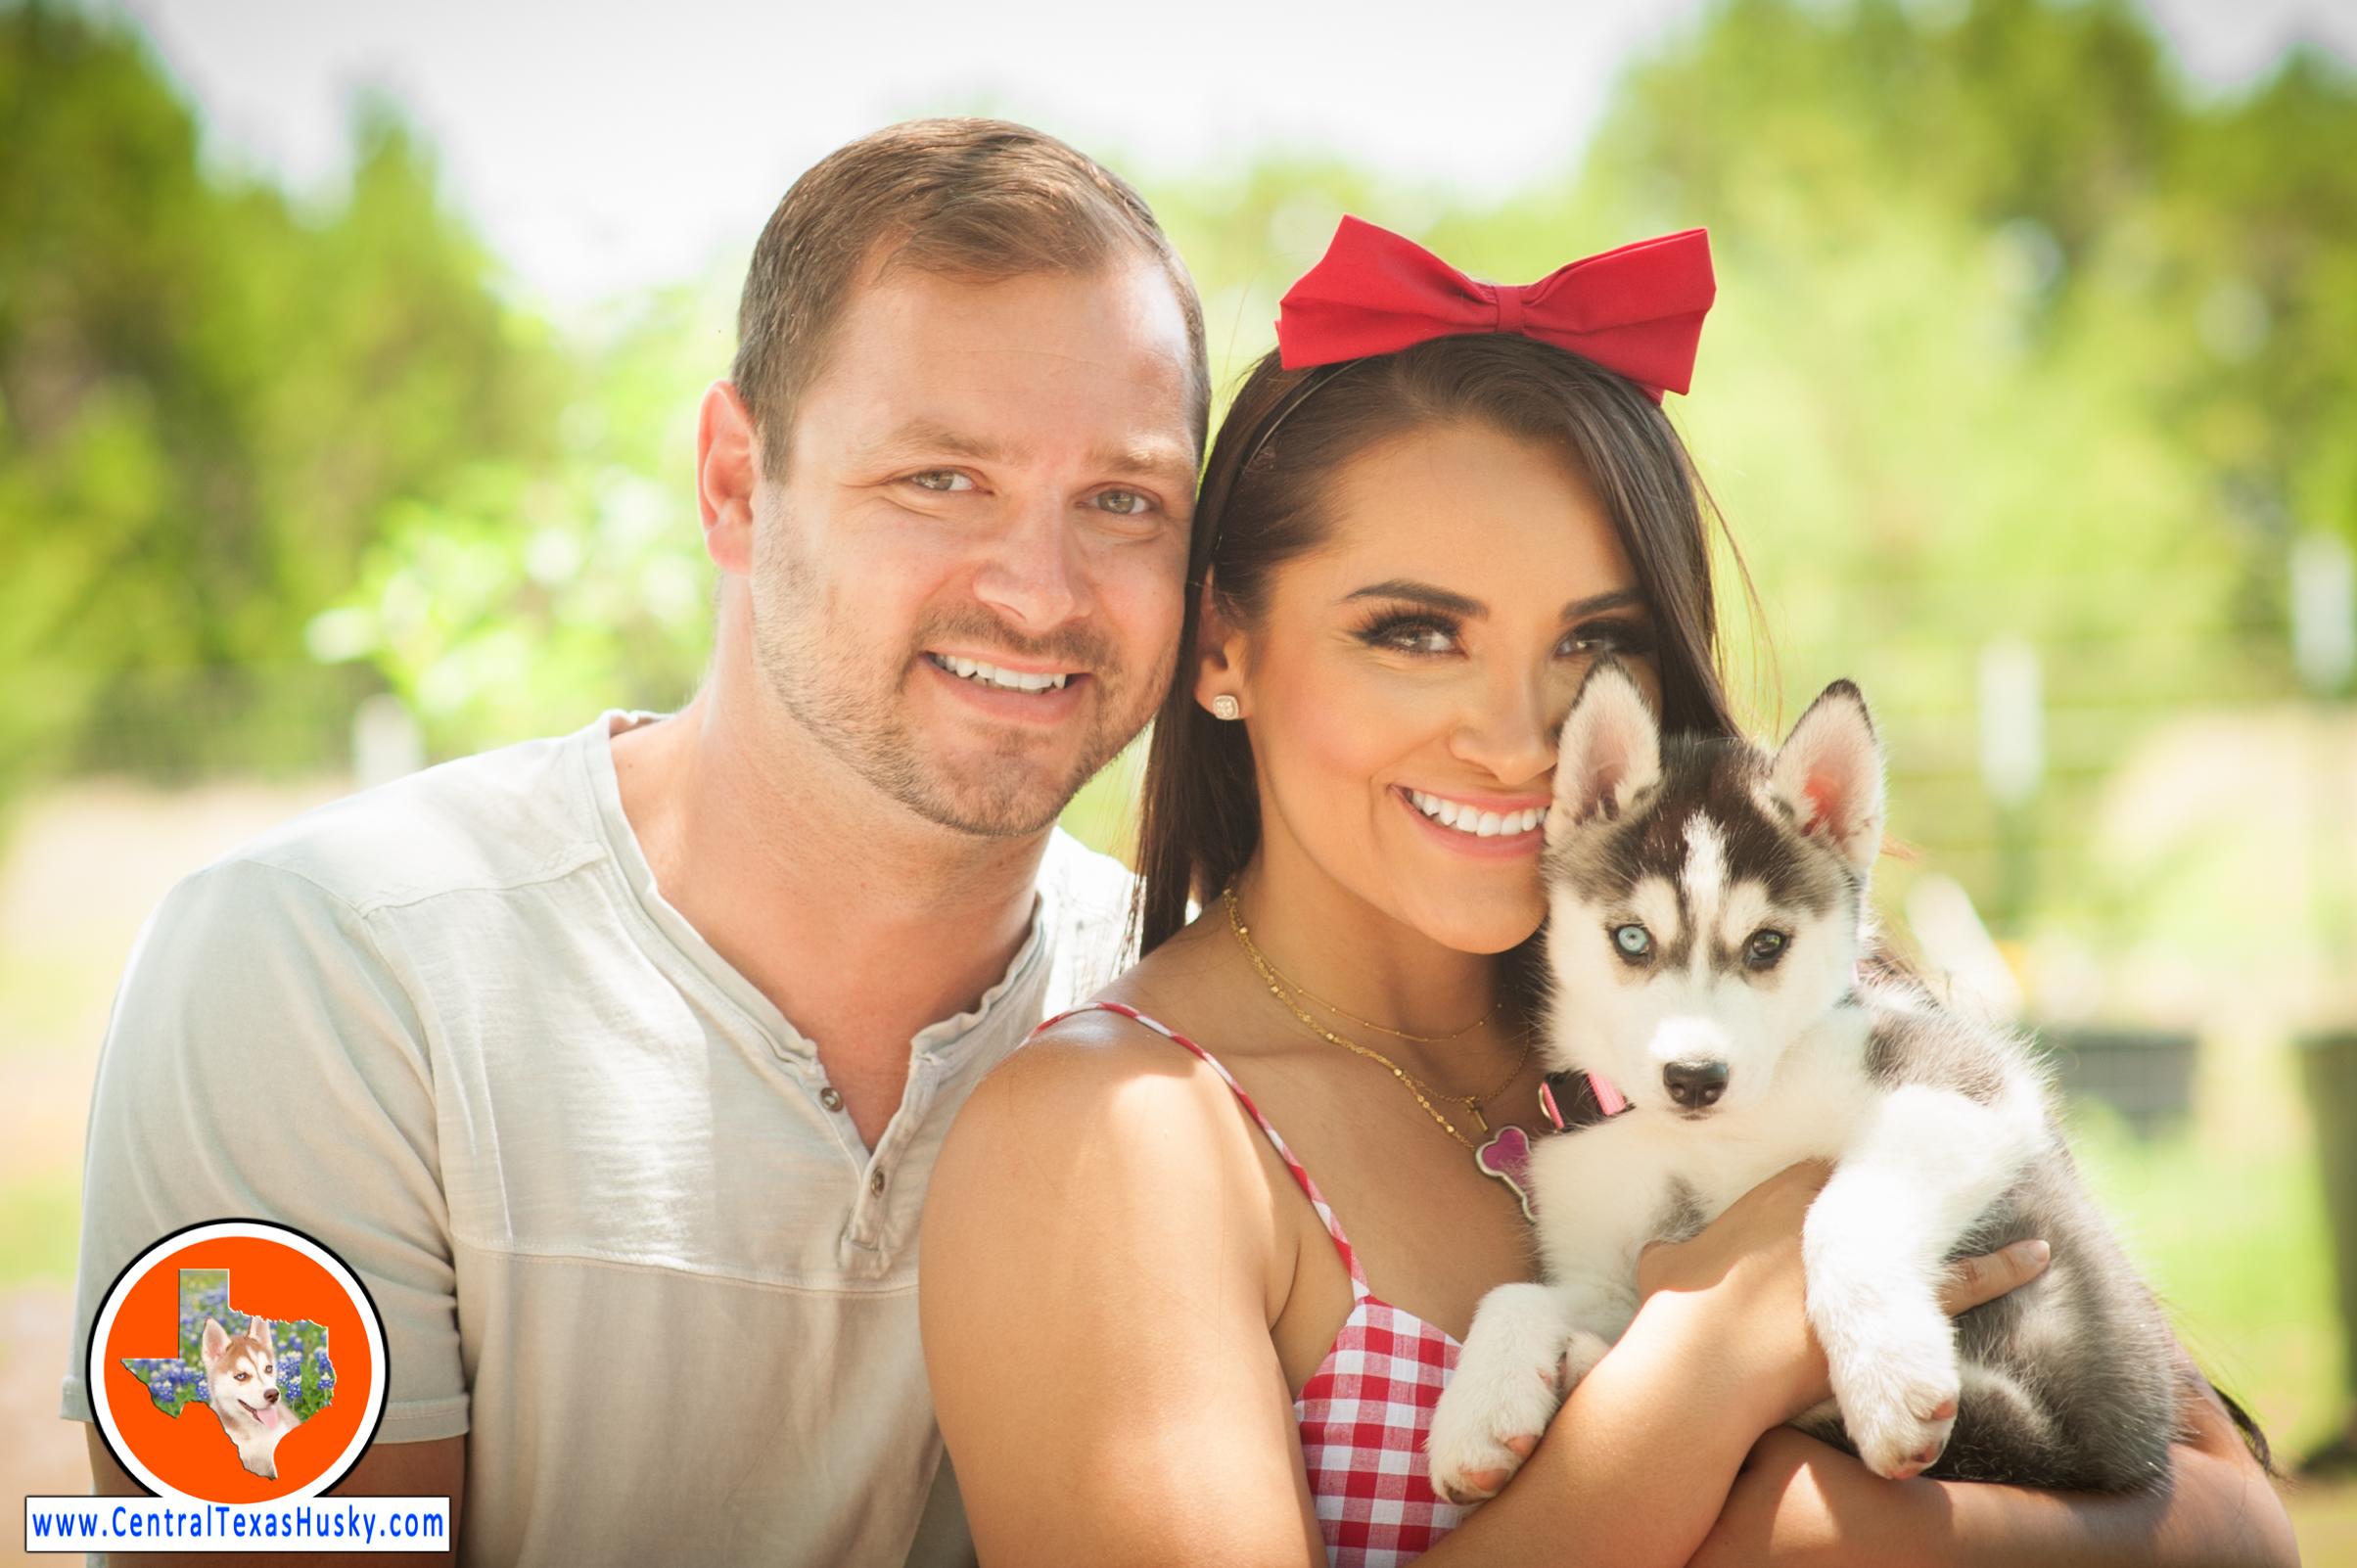 central-texas-husky_austin-siberian-husky-breeder_705799_20180526